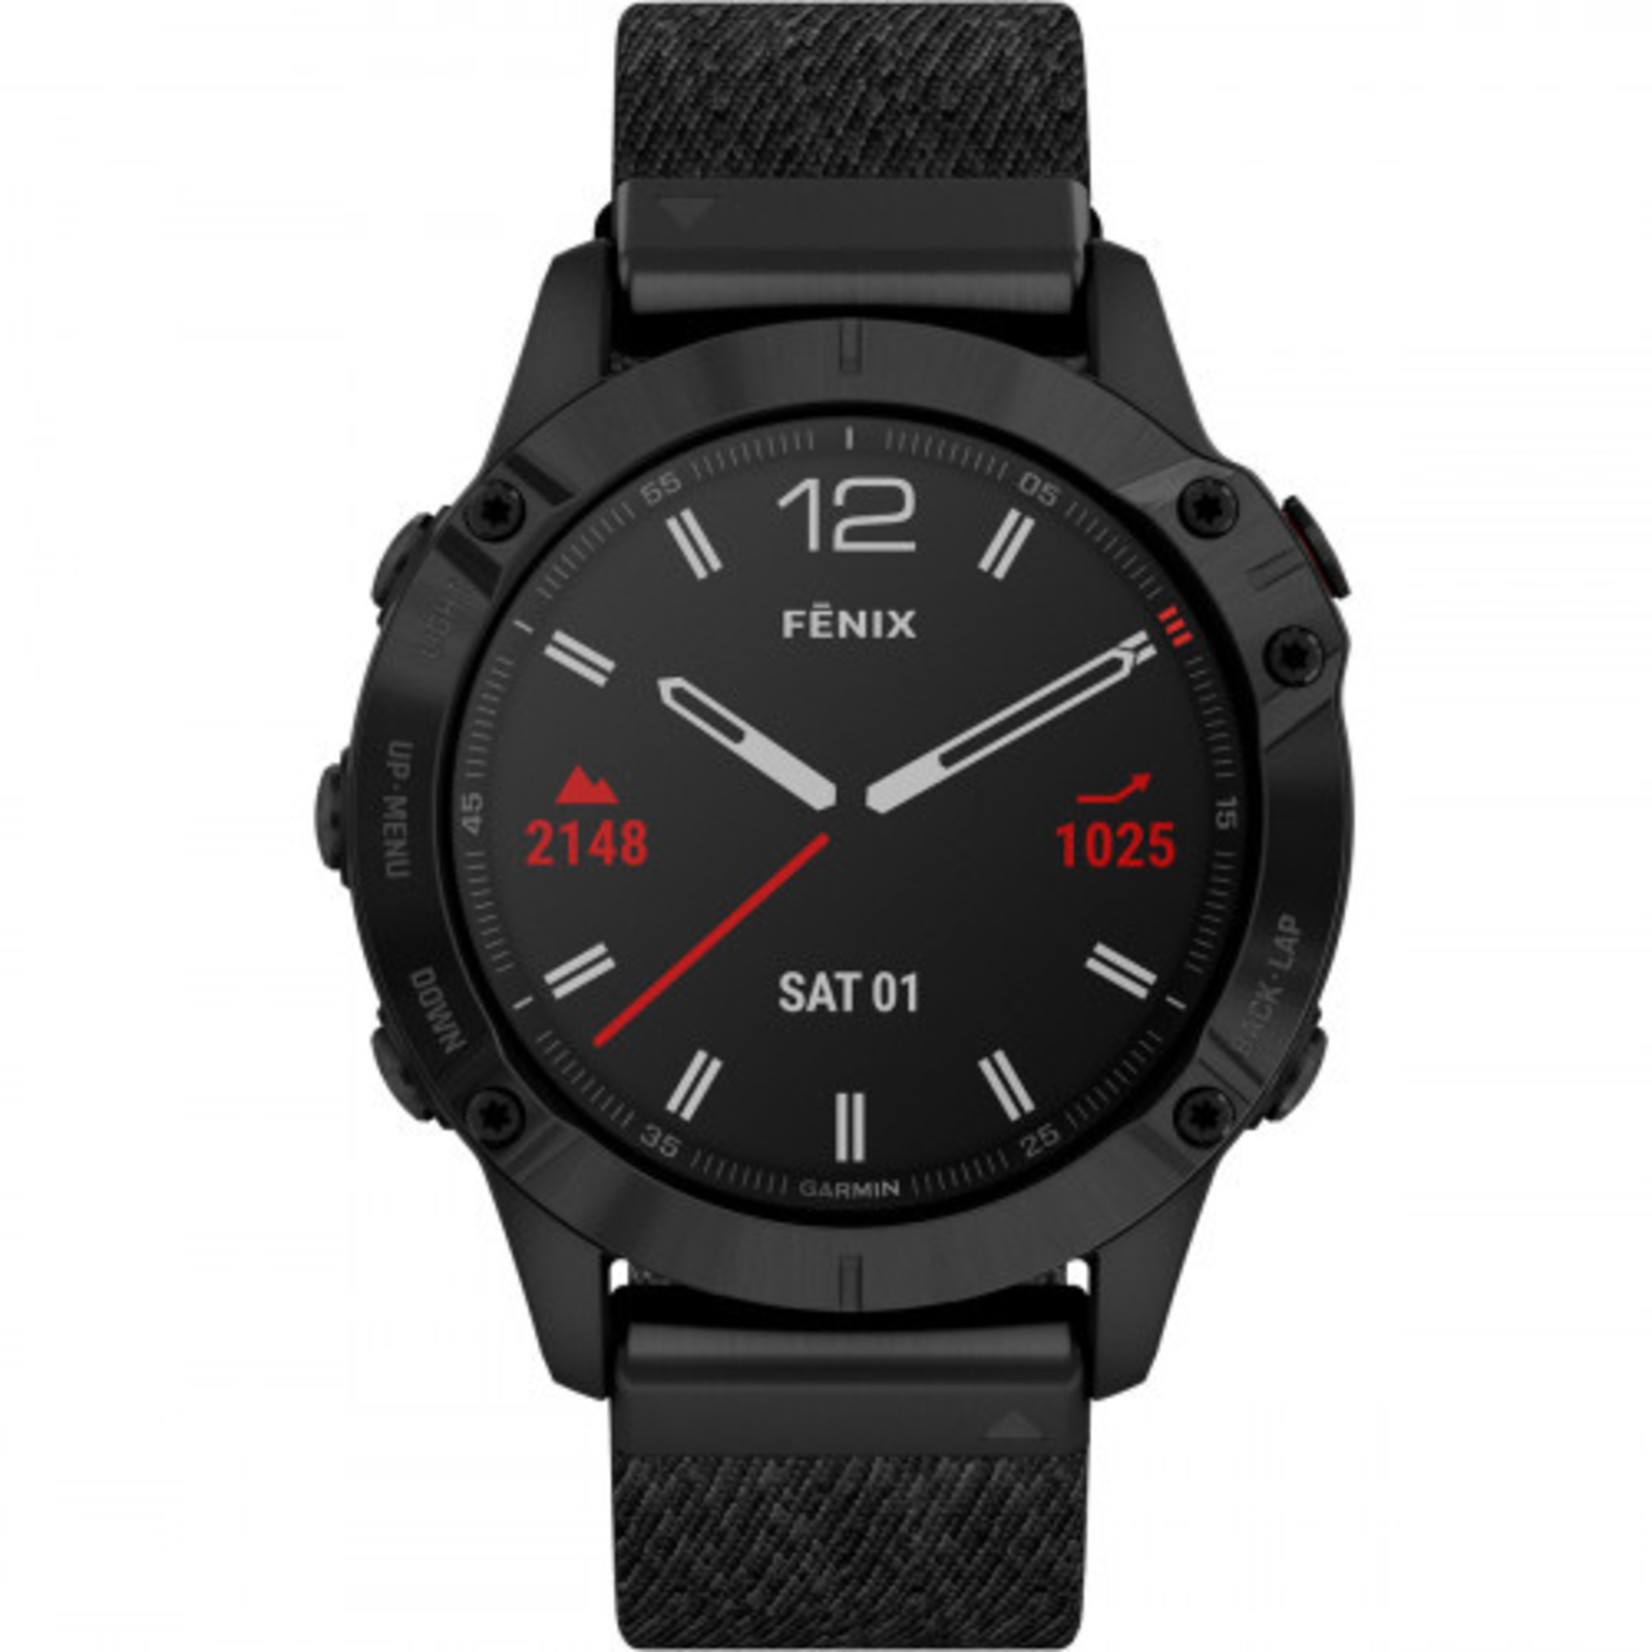 Garmin fēnix® 6 Pro - Black with Black Band